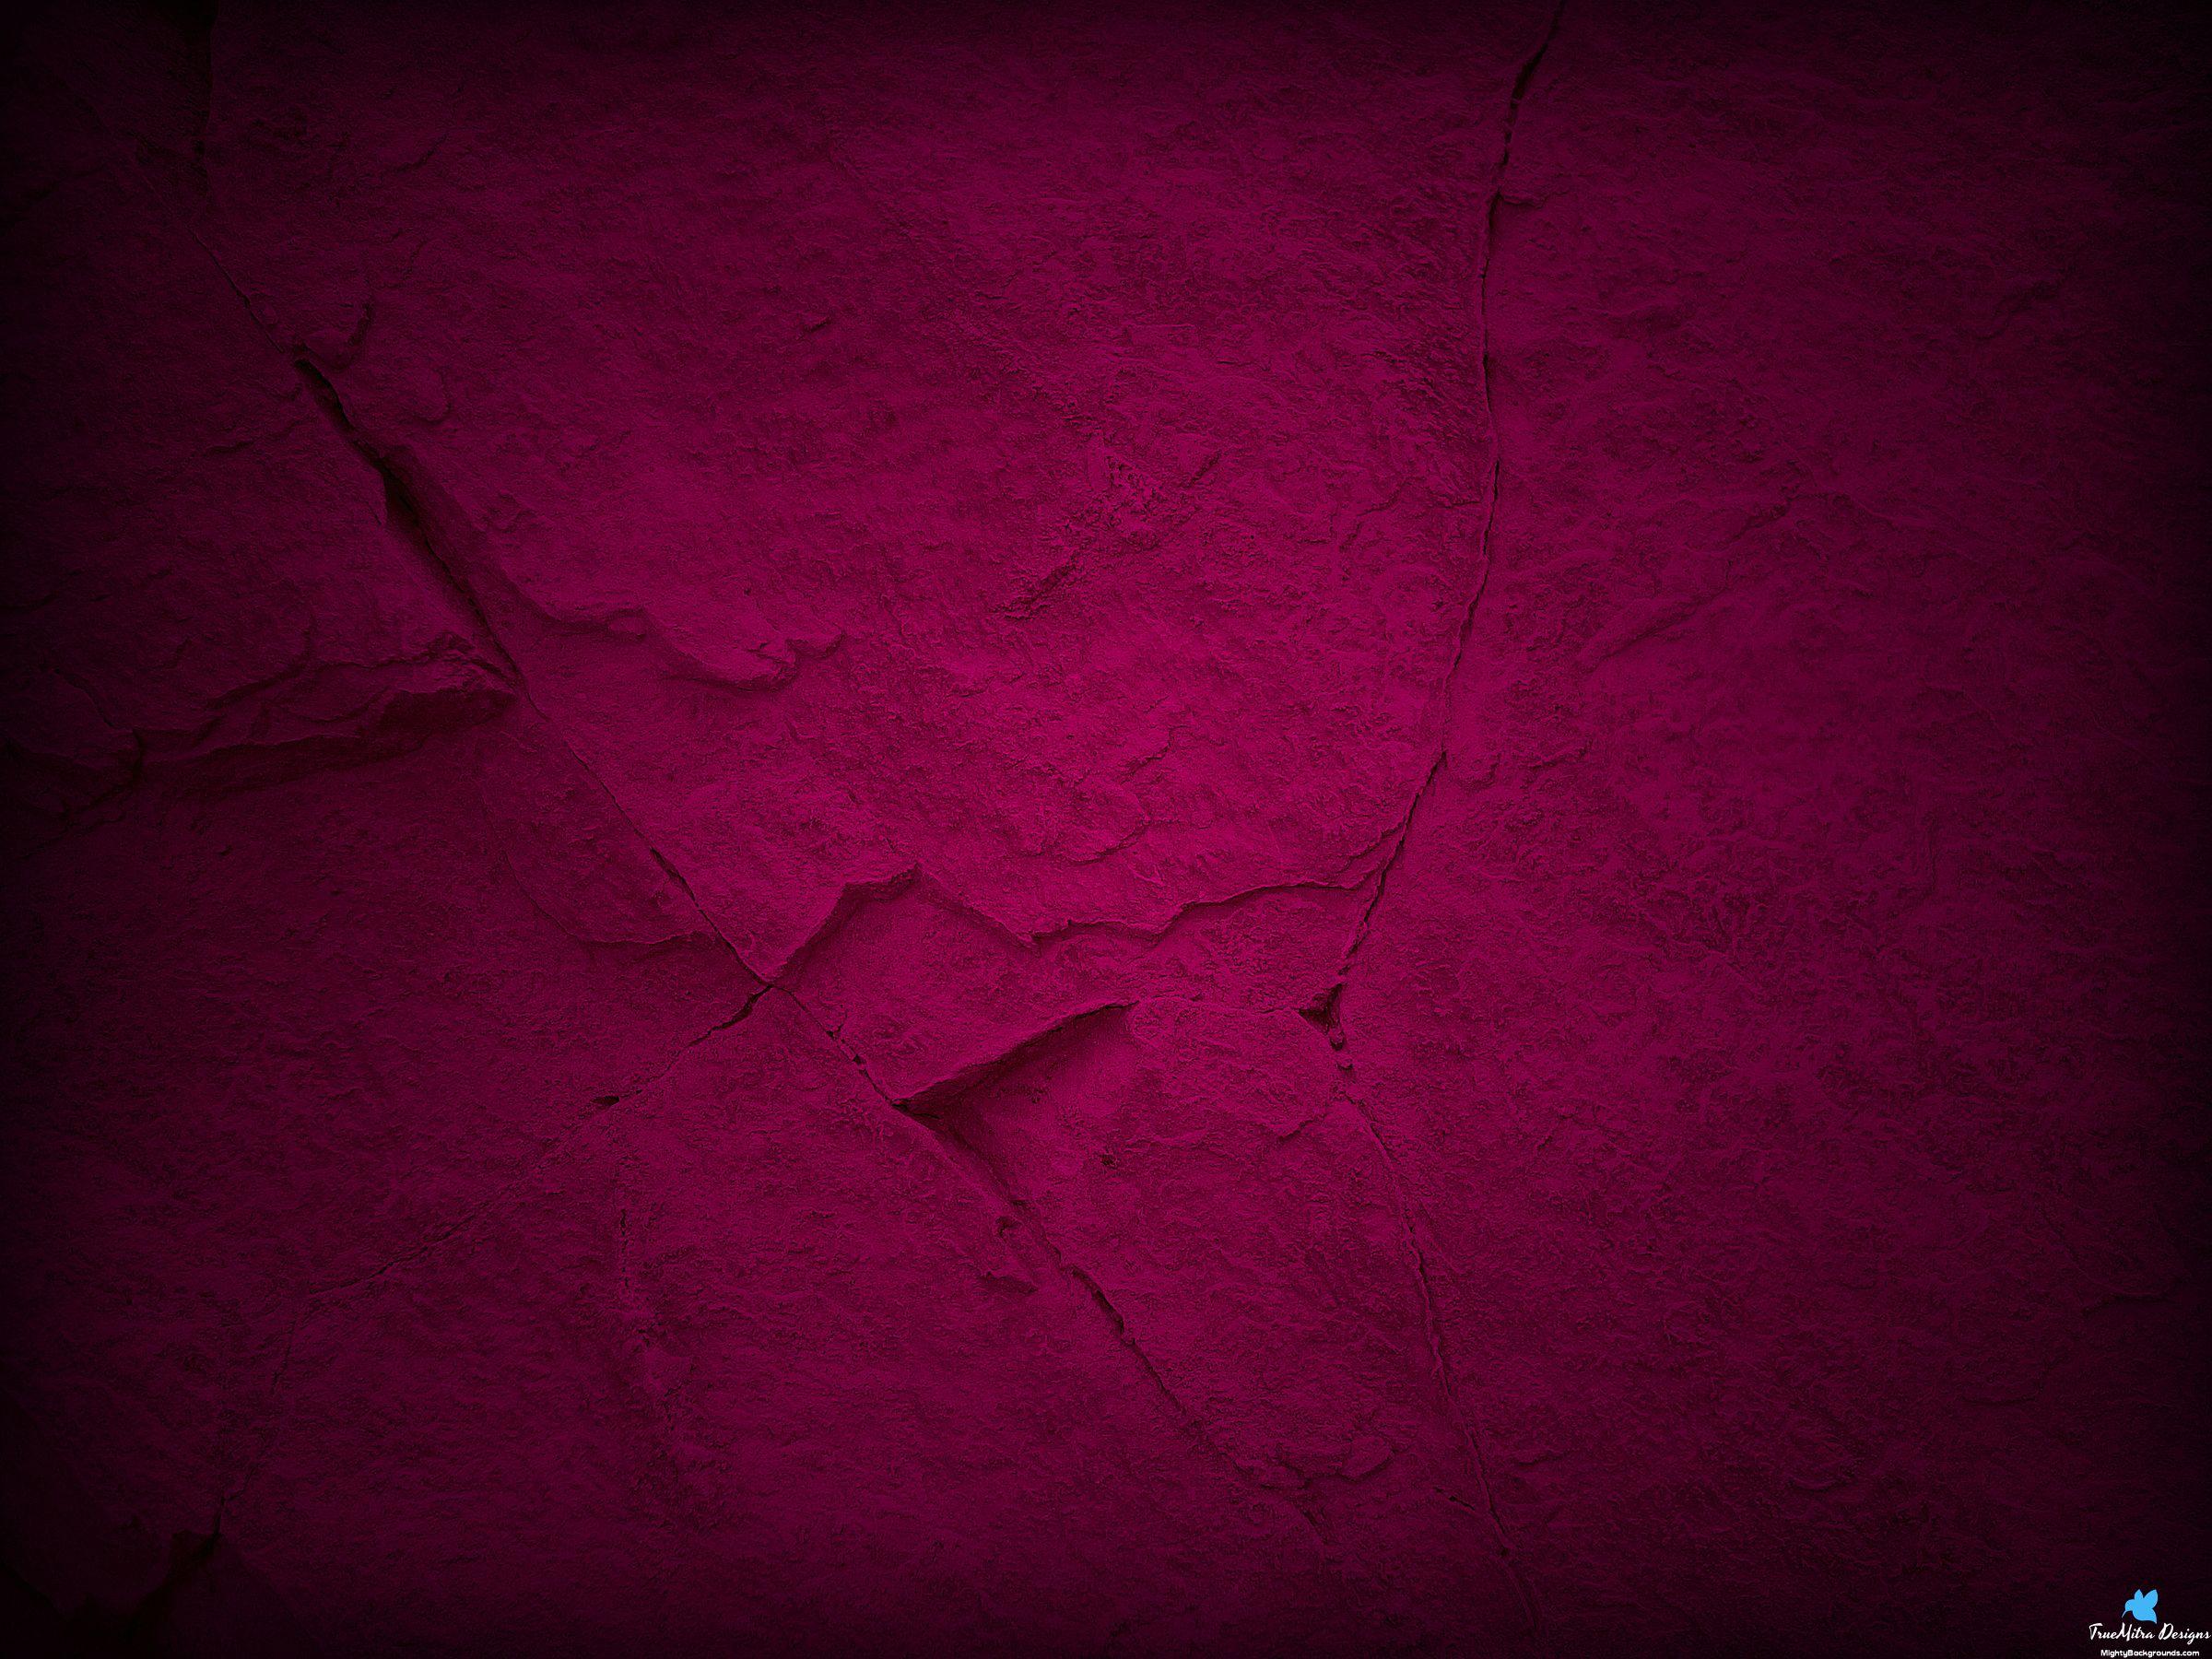 Dark magenta background image mm mm magenta in 2019 magenta magenta wedding purple velvet - Dark magenta wallpaper ...